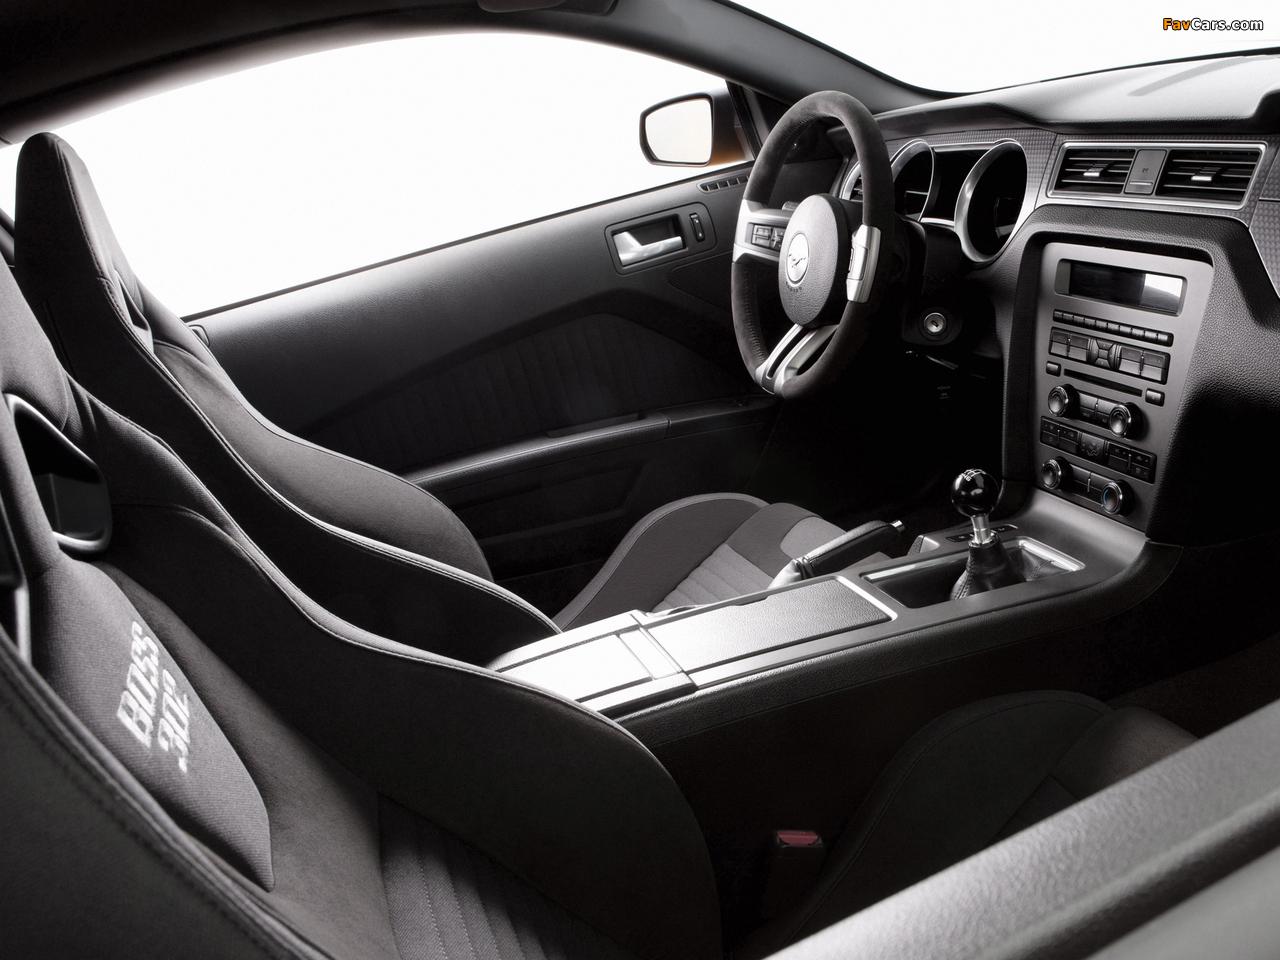 Mustang Boss 302 2012 images (1280 x 960)